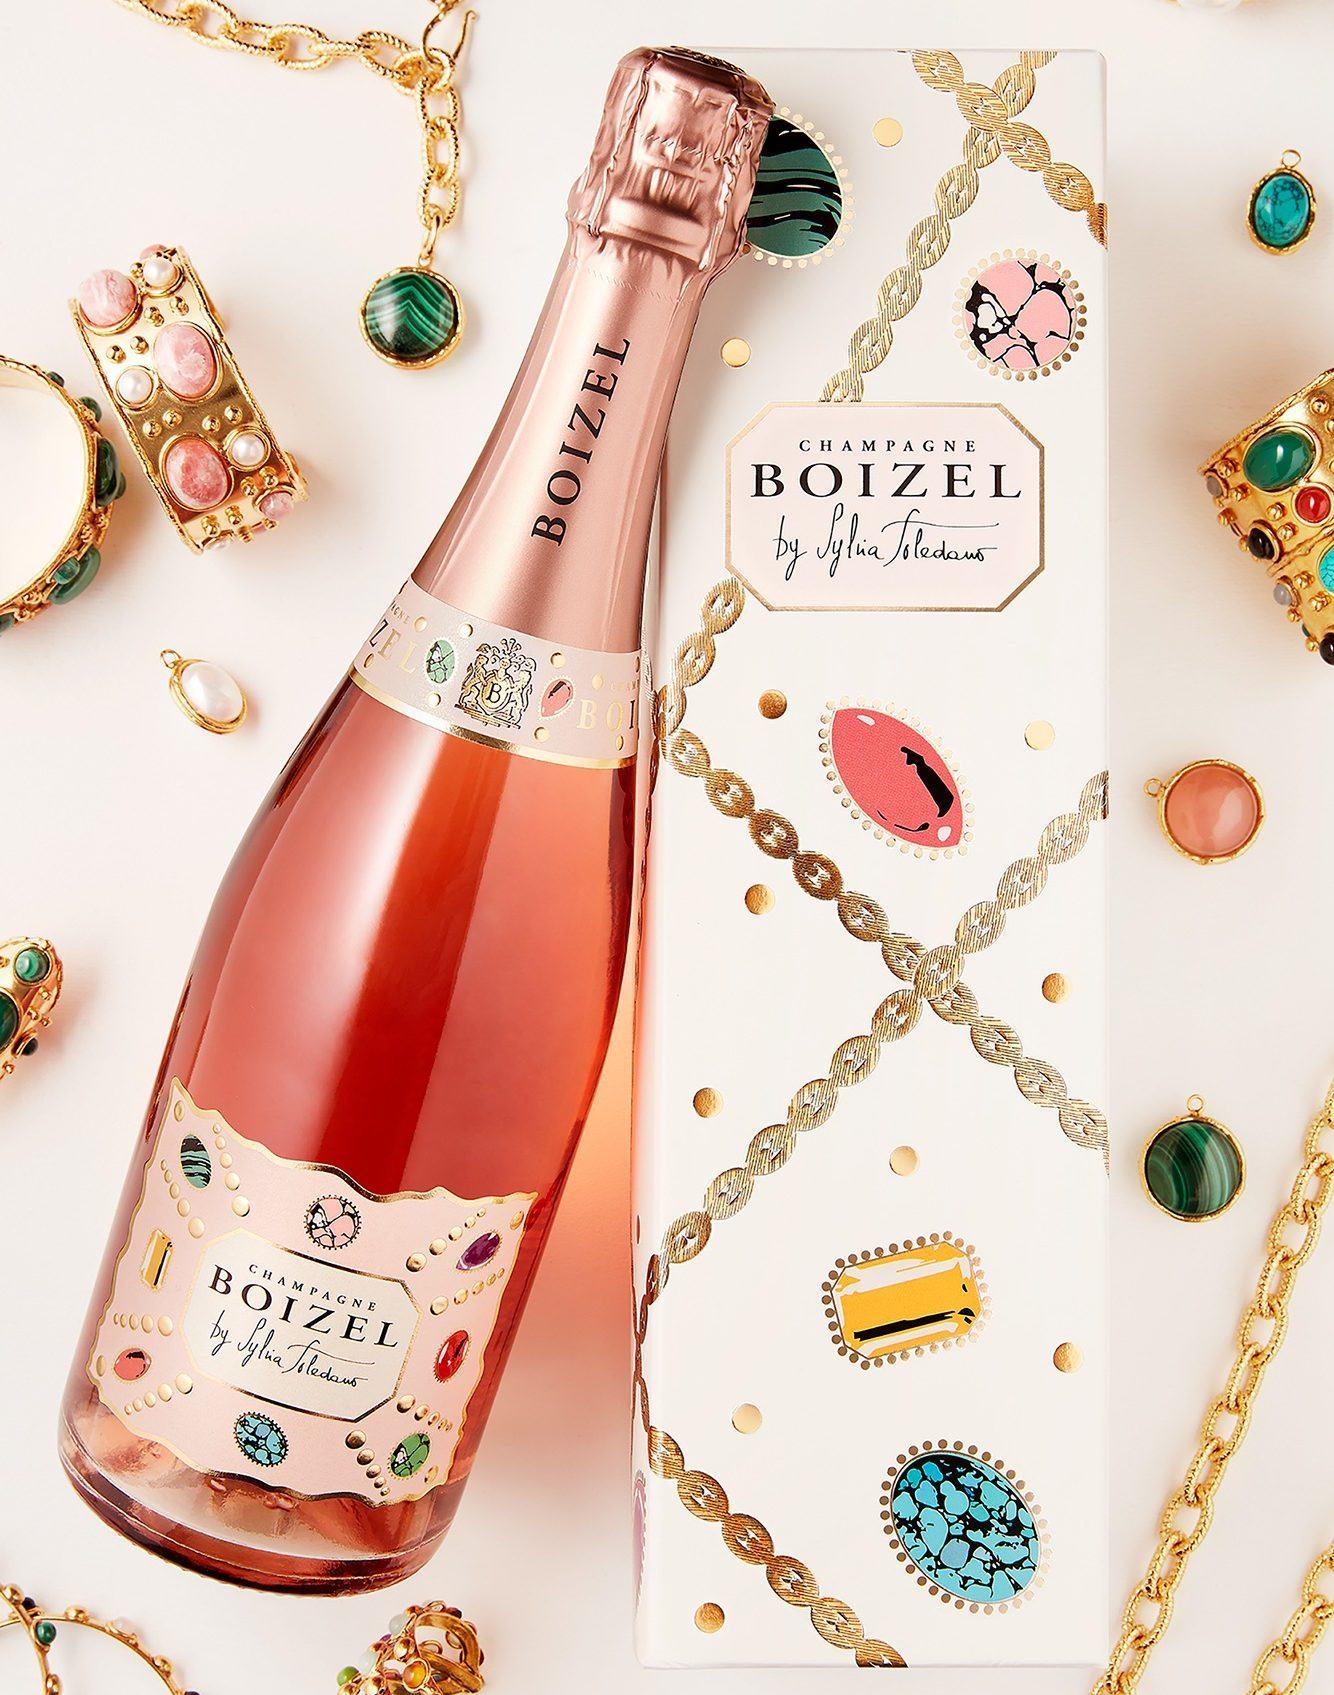 The Boizel by - Champagne Boizel - Epernay France